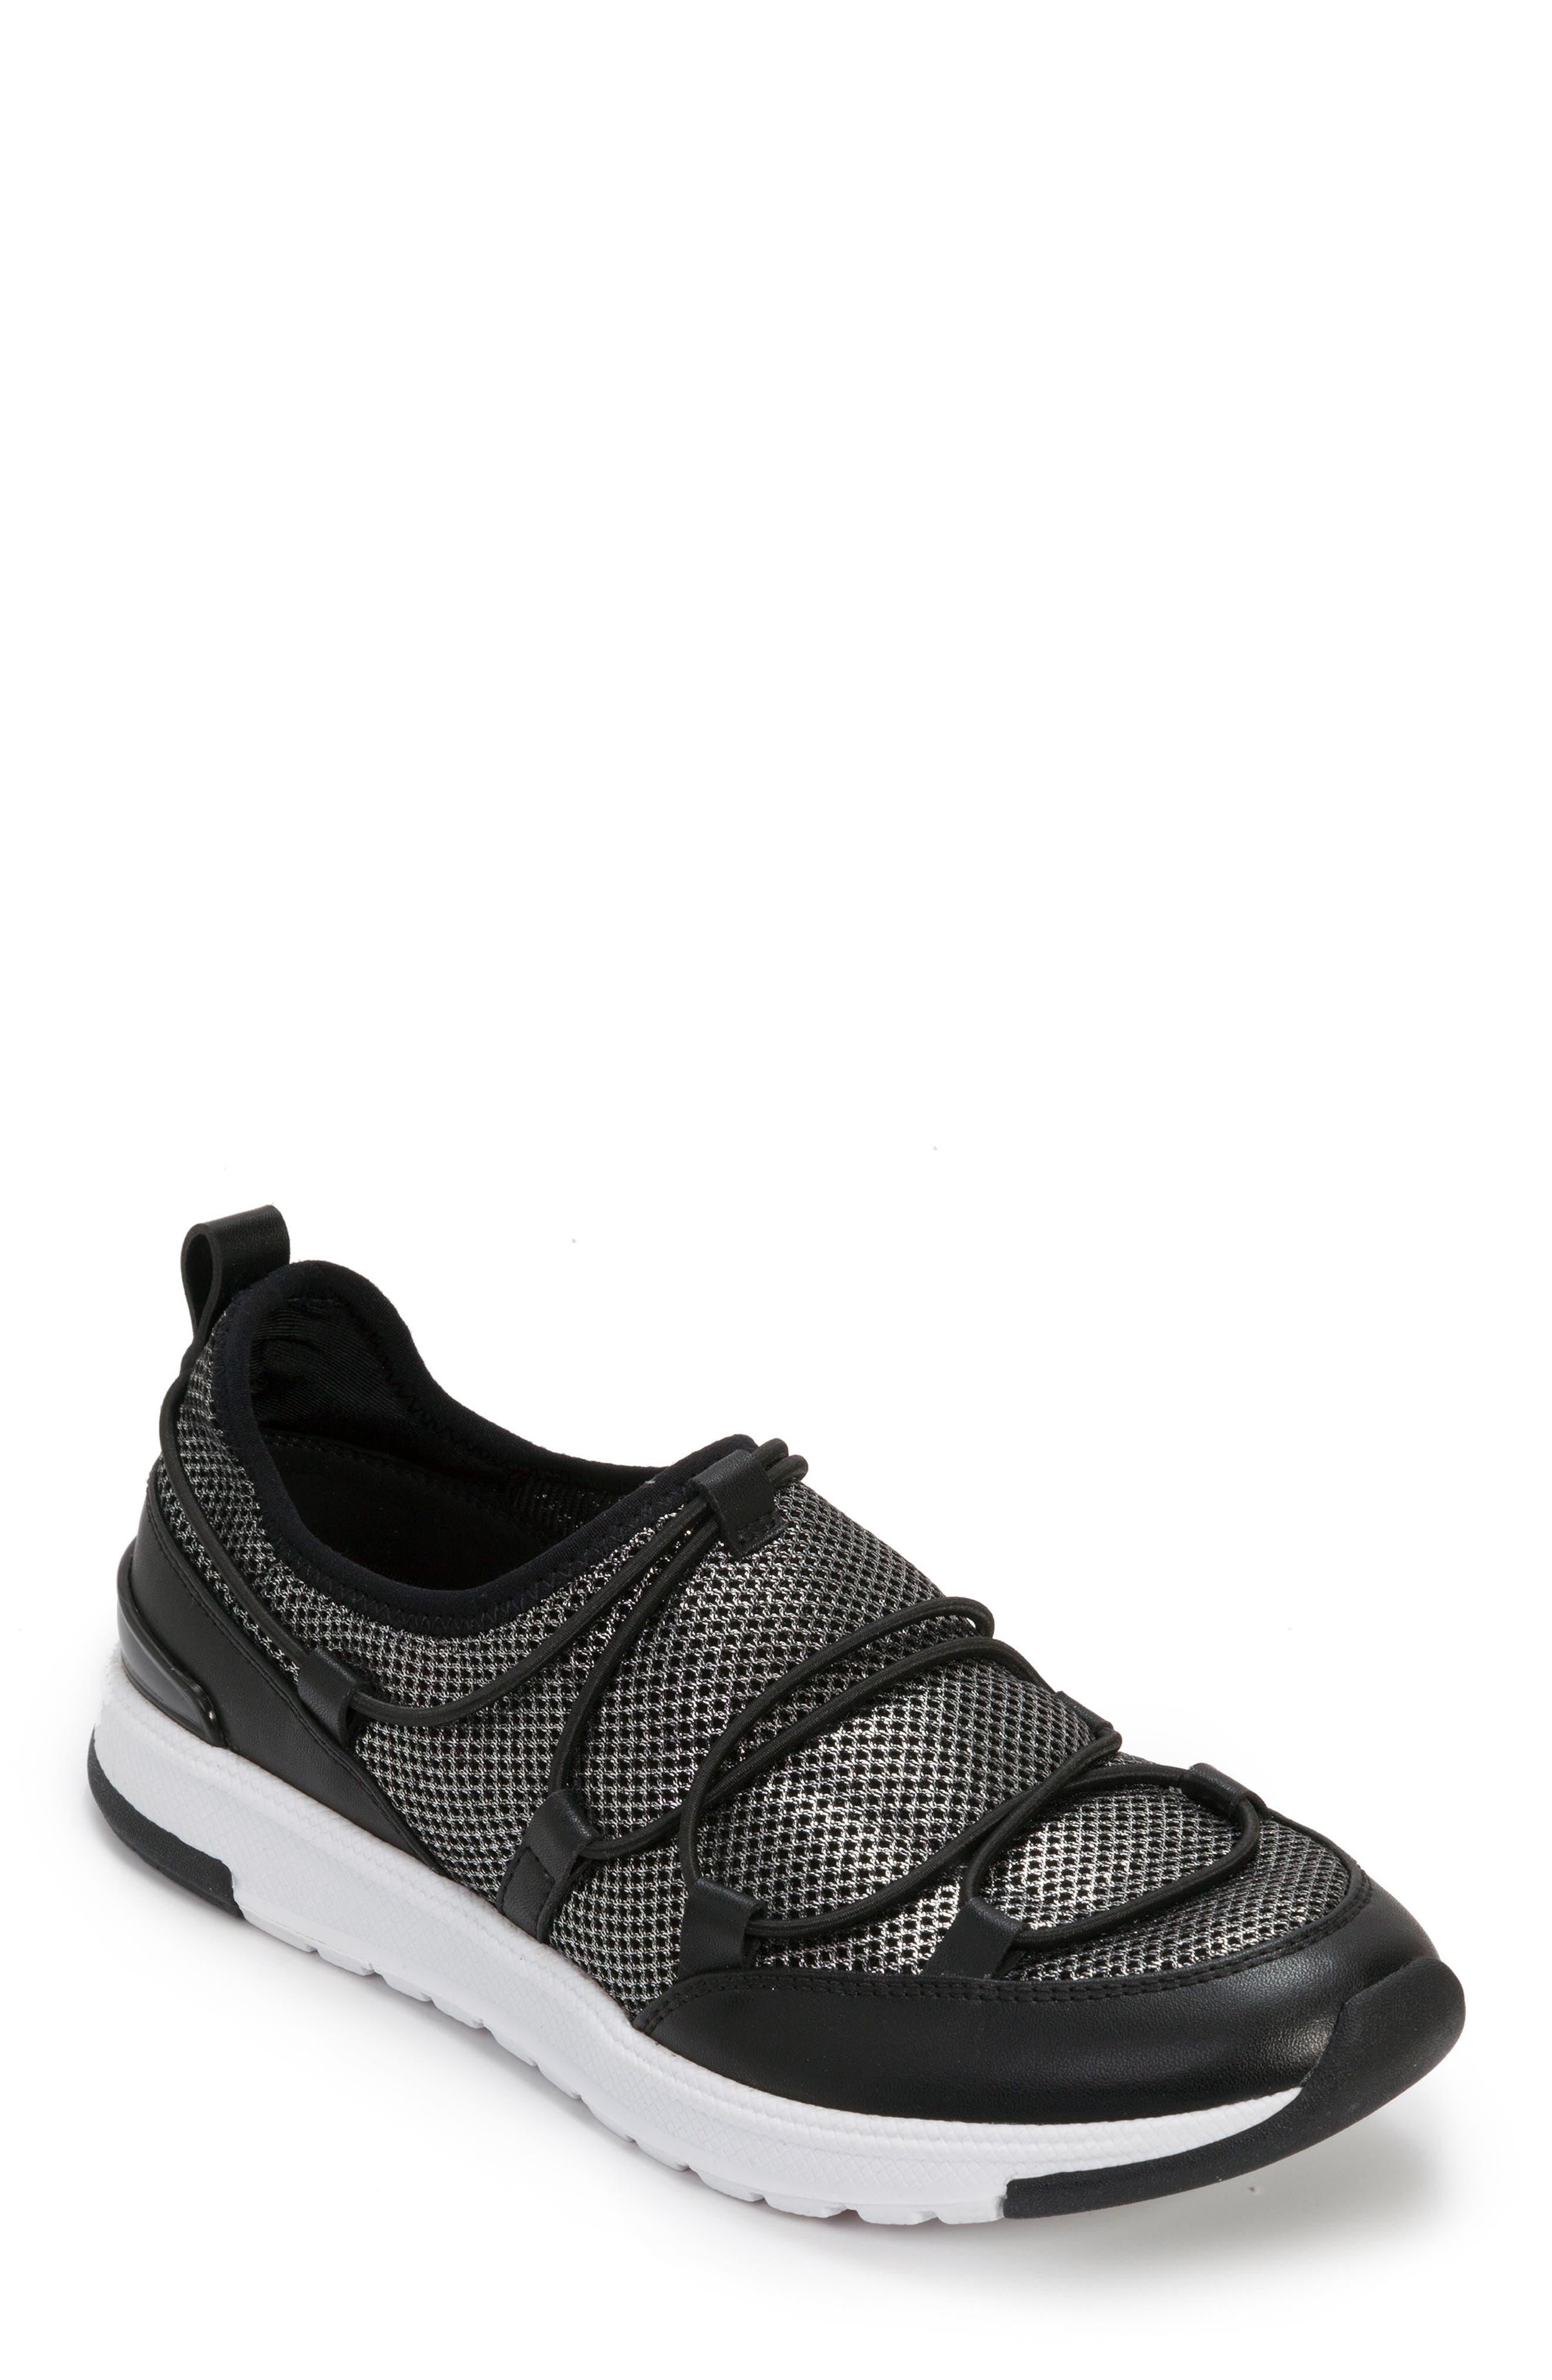 FOOT PETALS Bree Sneaker, Main, color, BLACK/ PEWTER